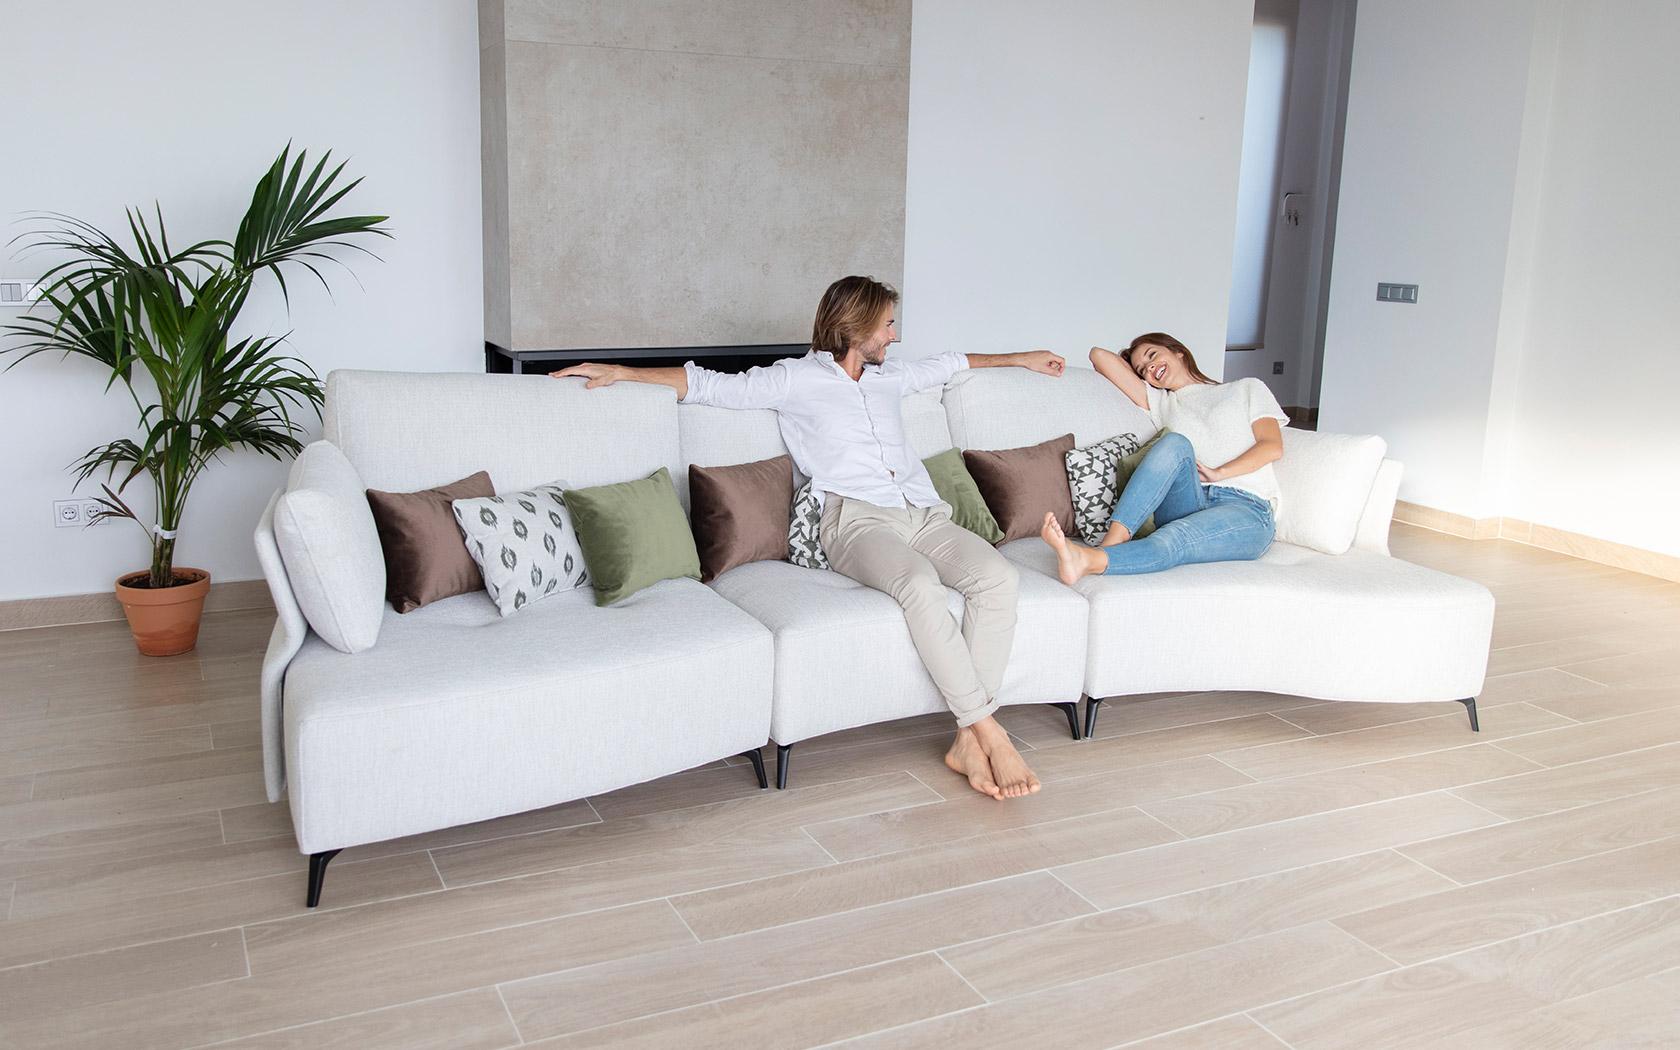 kalahari sofa 2021 11